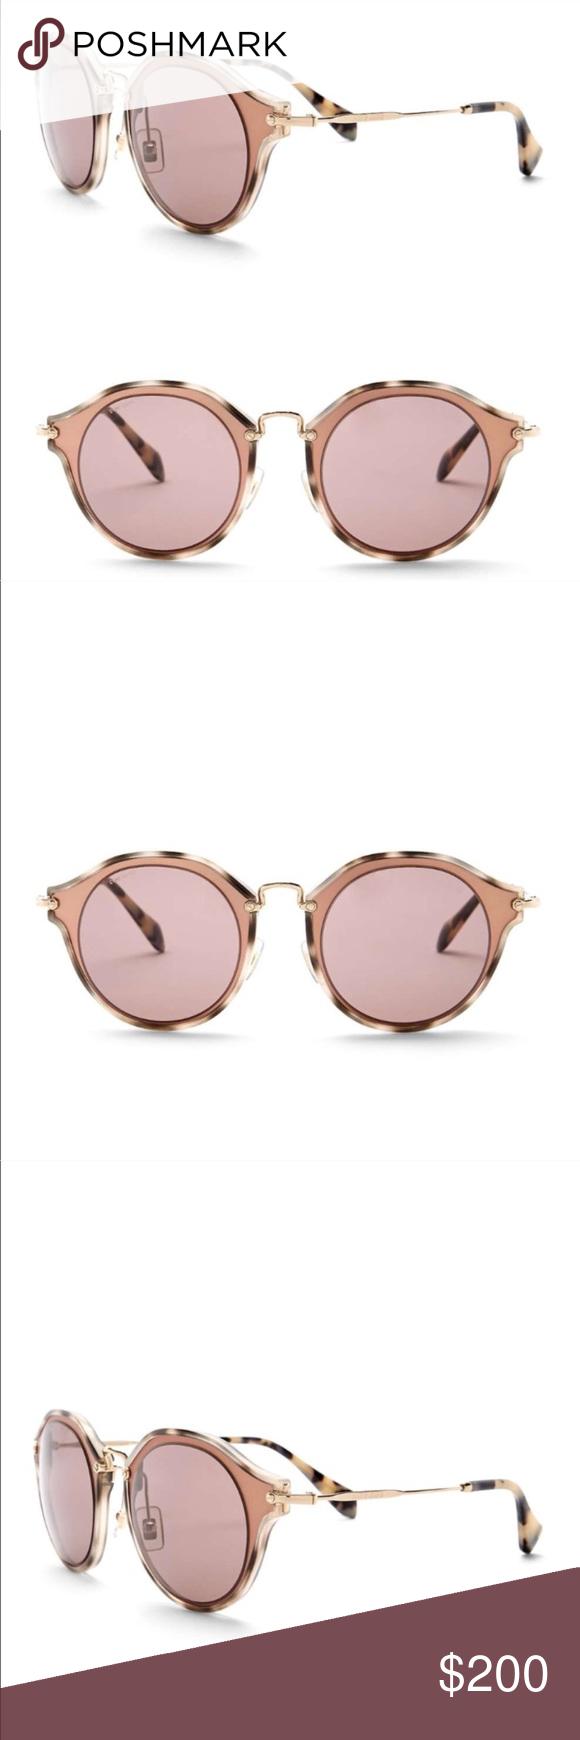 596d953f968b MIU MIU Matte Pink Round Sunglasses MU51SS Worn twice